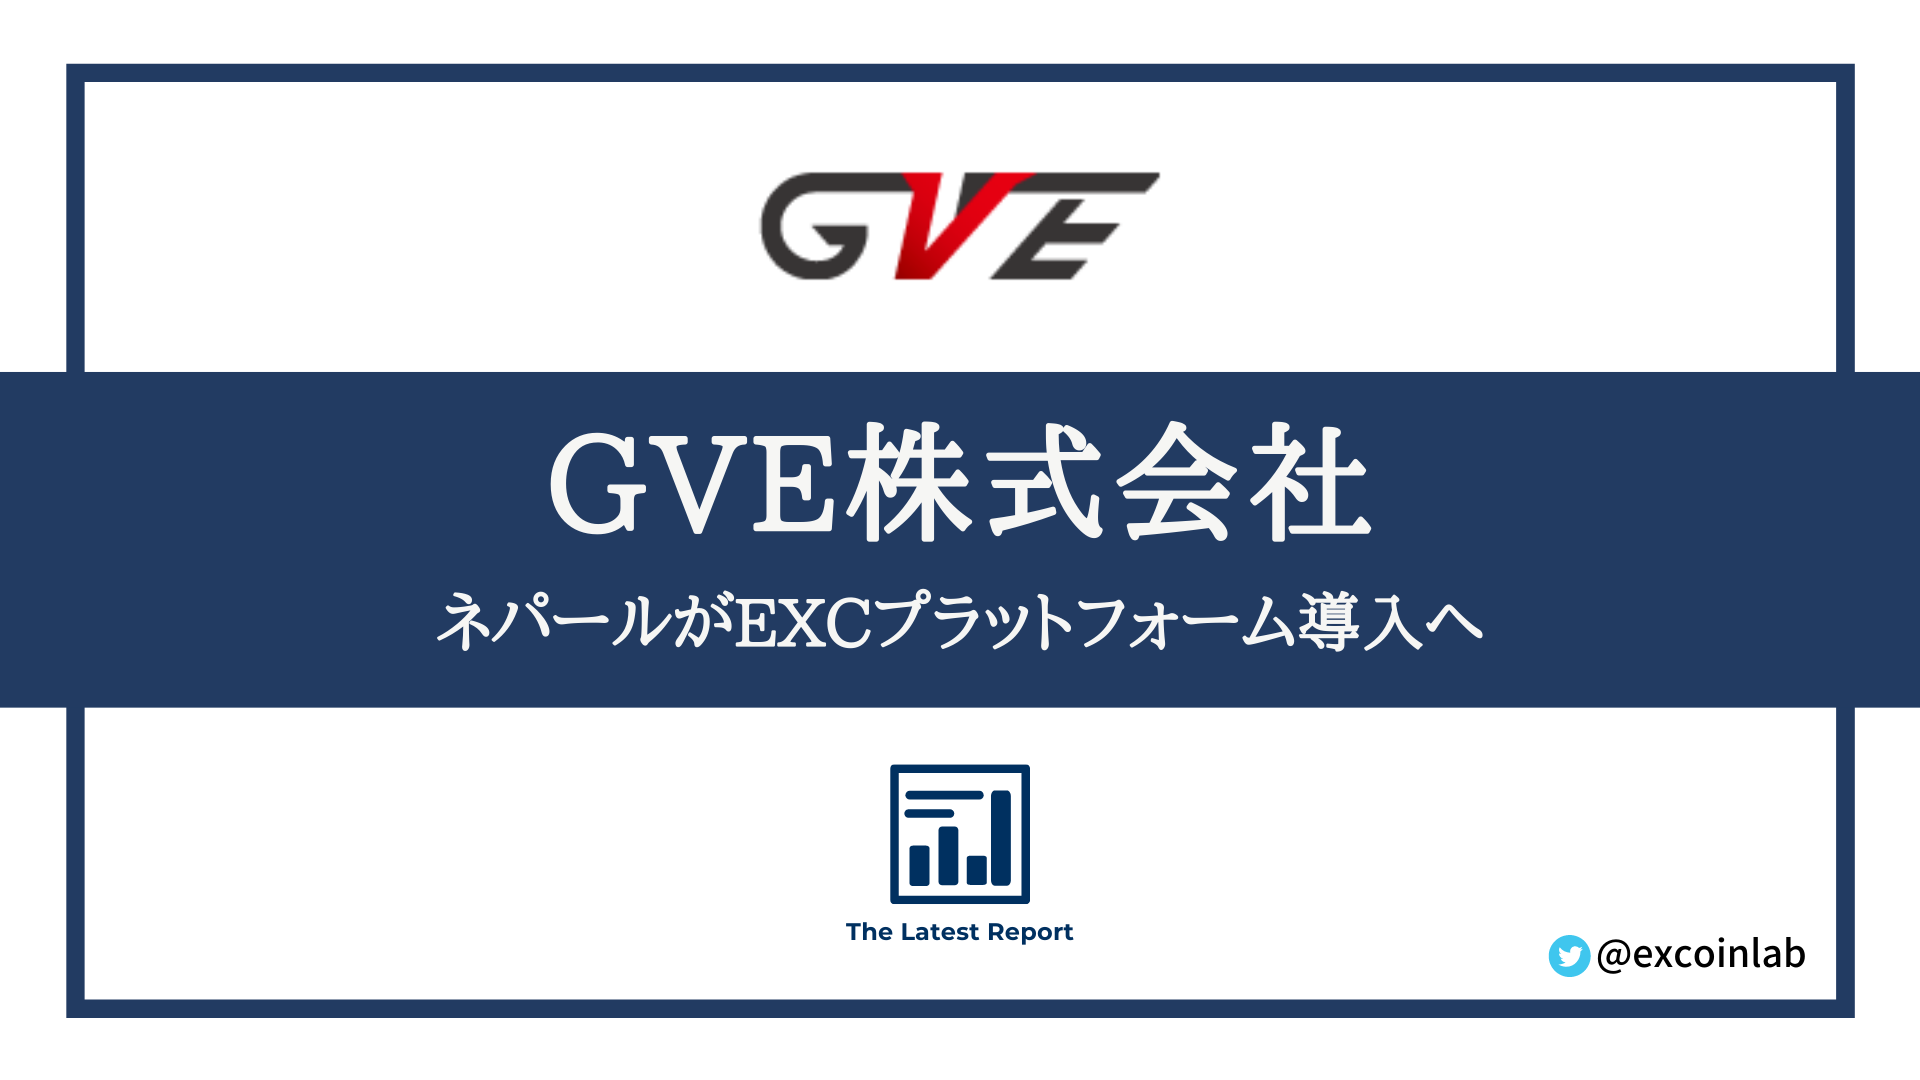 GVE株式会社とEXCプラットフォーム